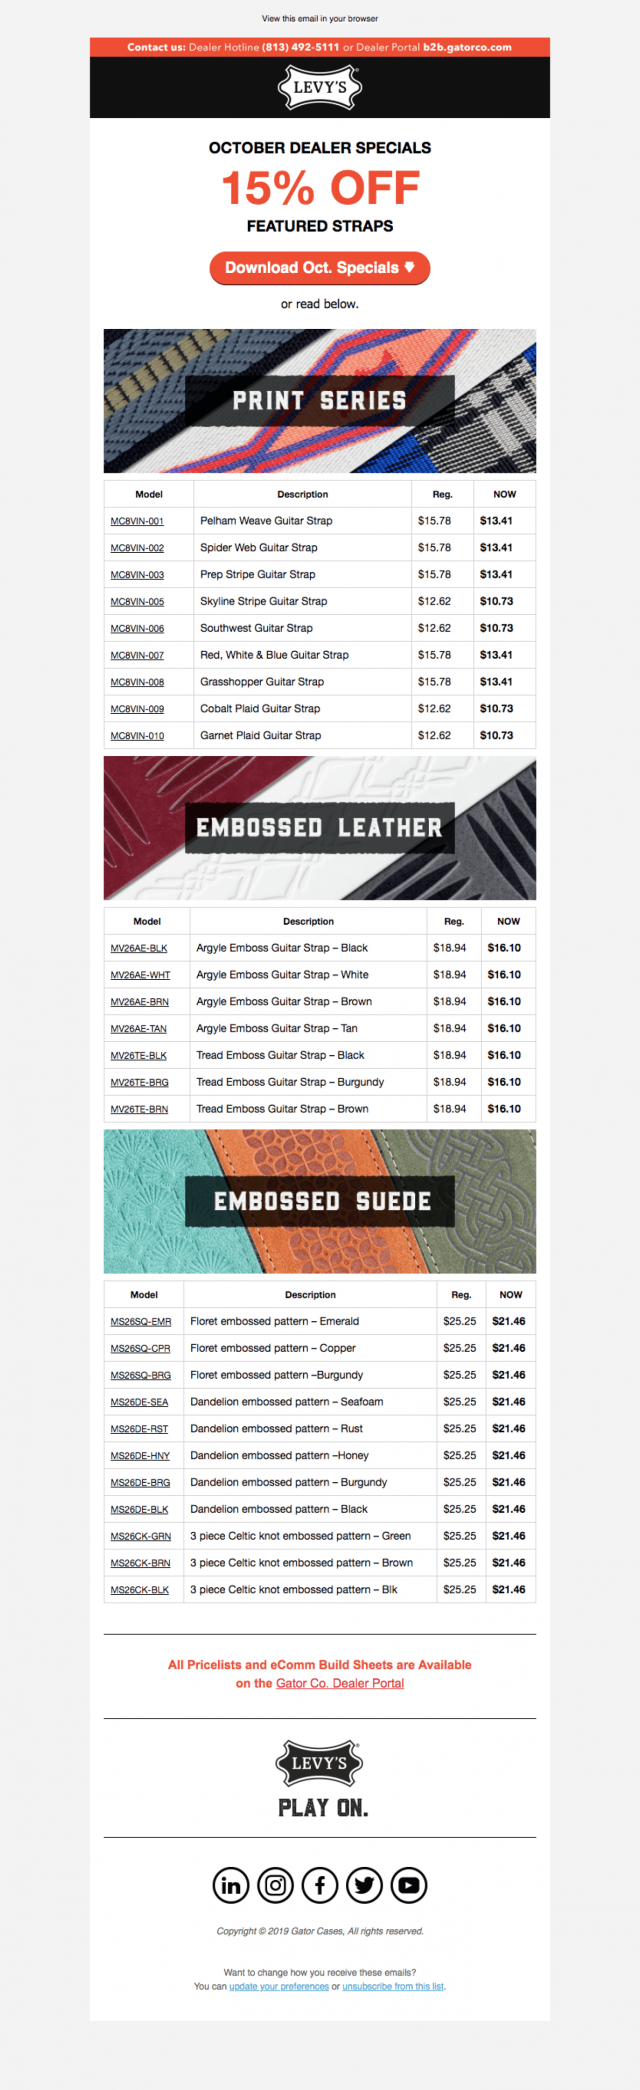 Email – Levys Dealer Specials